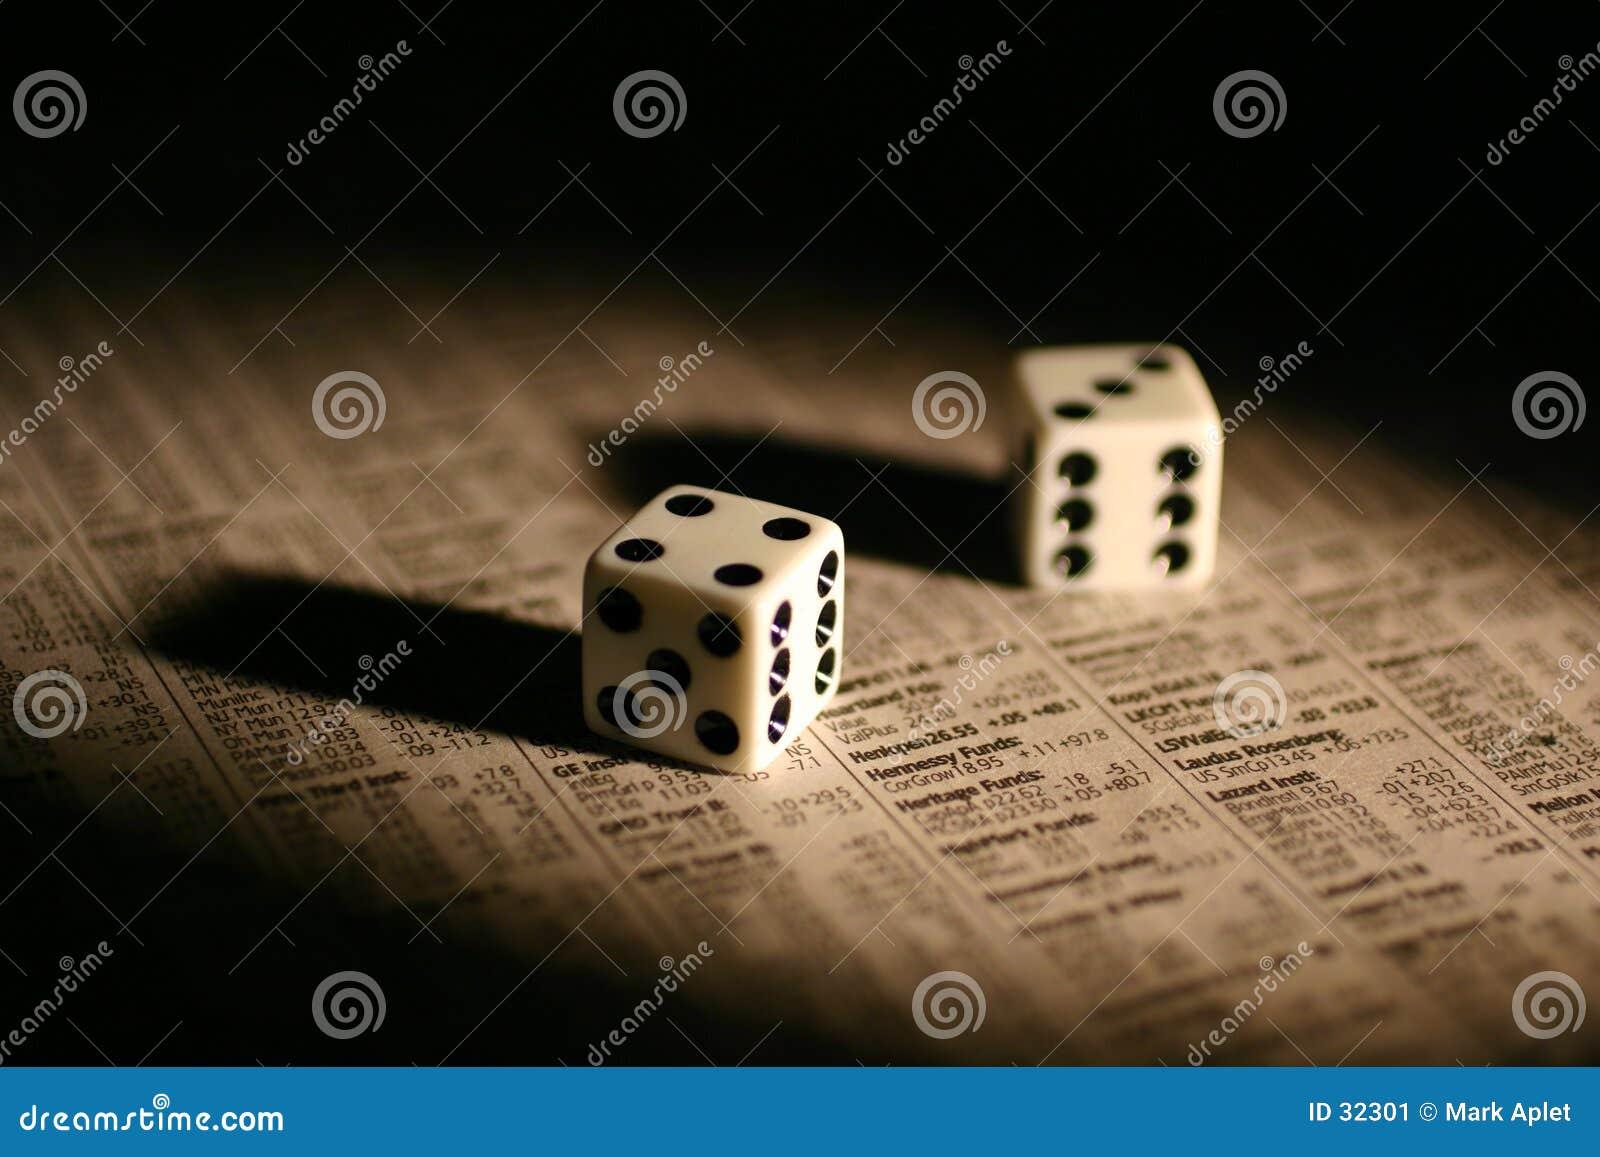 Download παίζοντας αποθέματα στοκ εικόνα. εικόνα από χρήματα, down - 32301